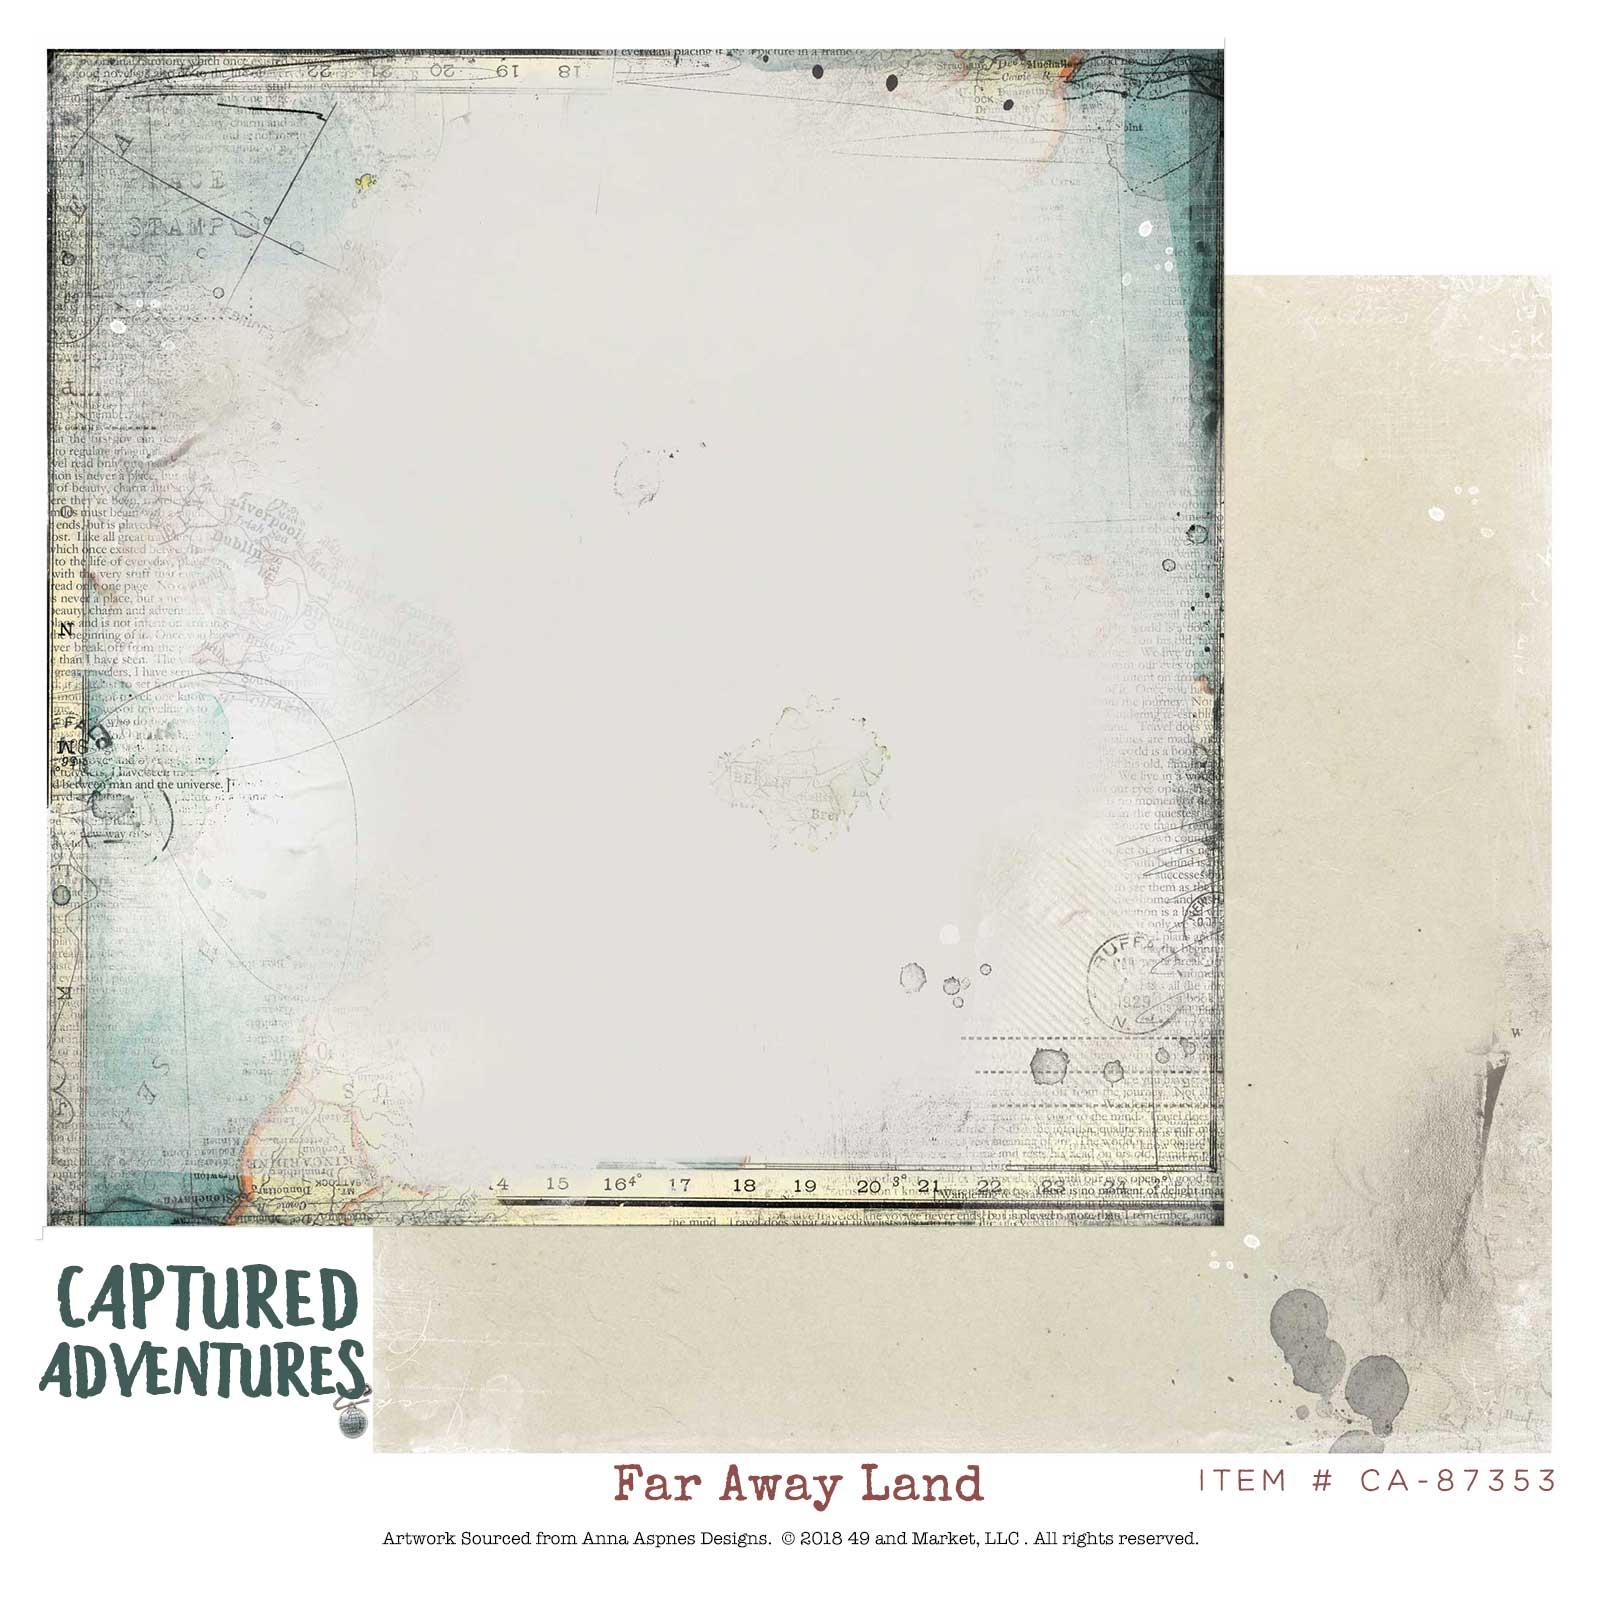 CA-87353-Far-Away-Land